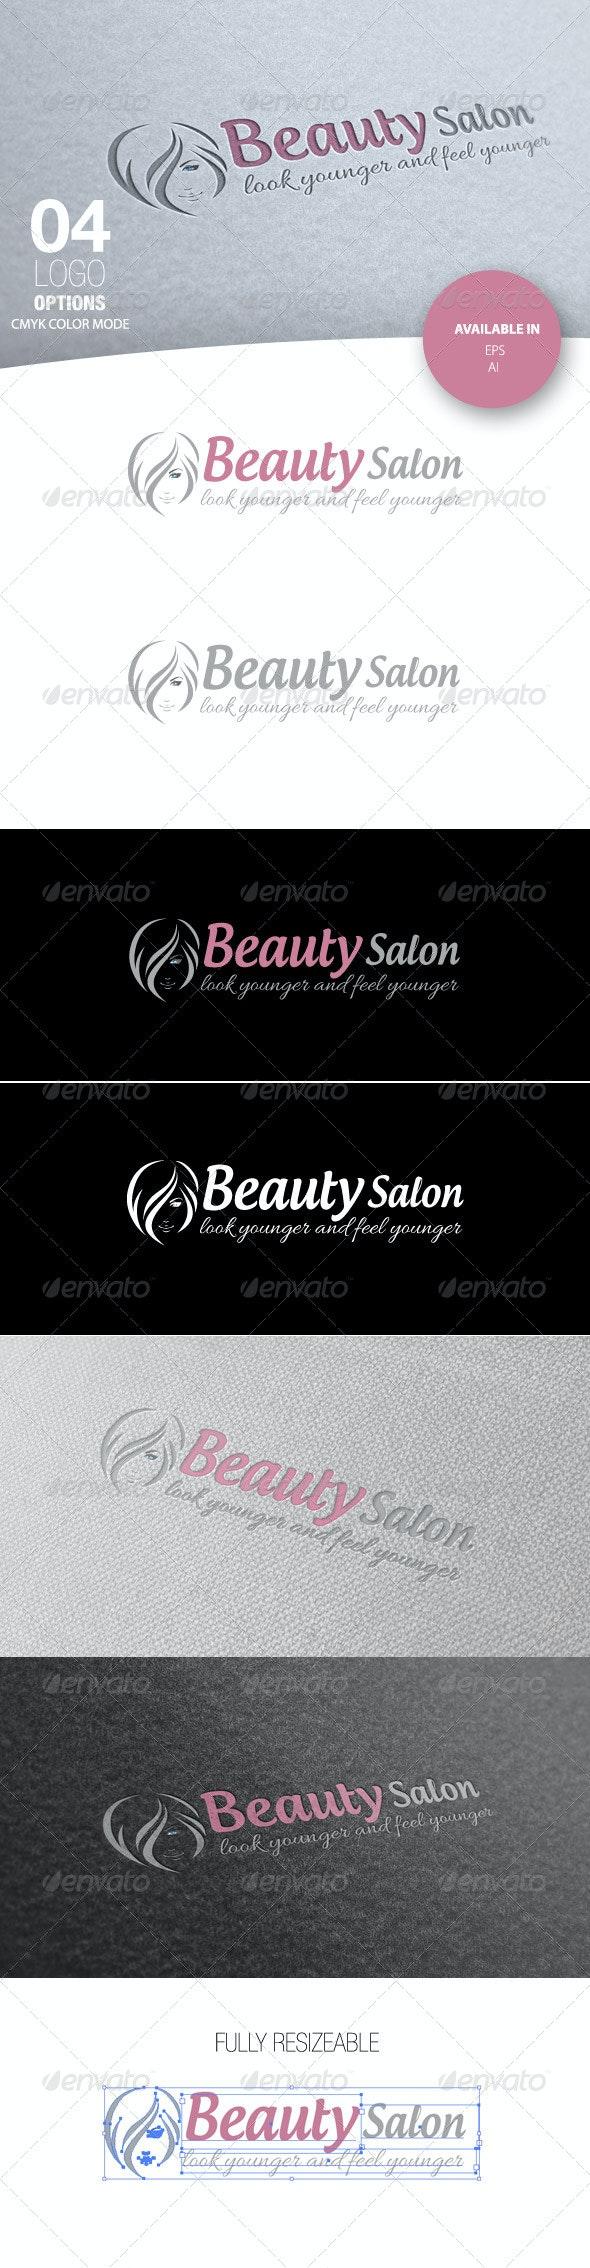 Beauty Salon Logo - Nature Logo Templates